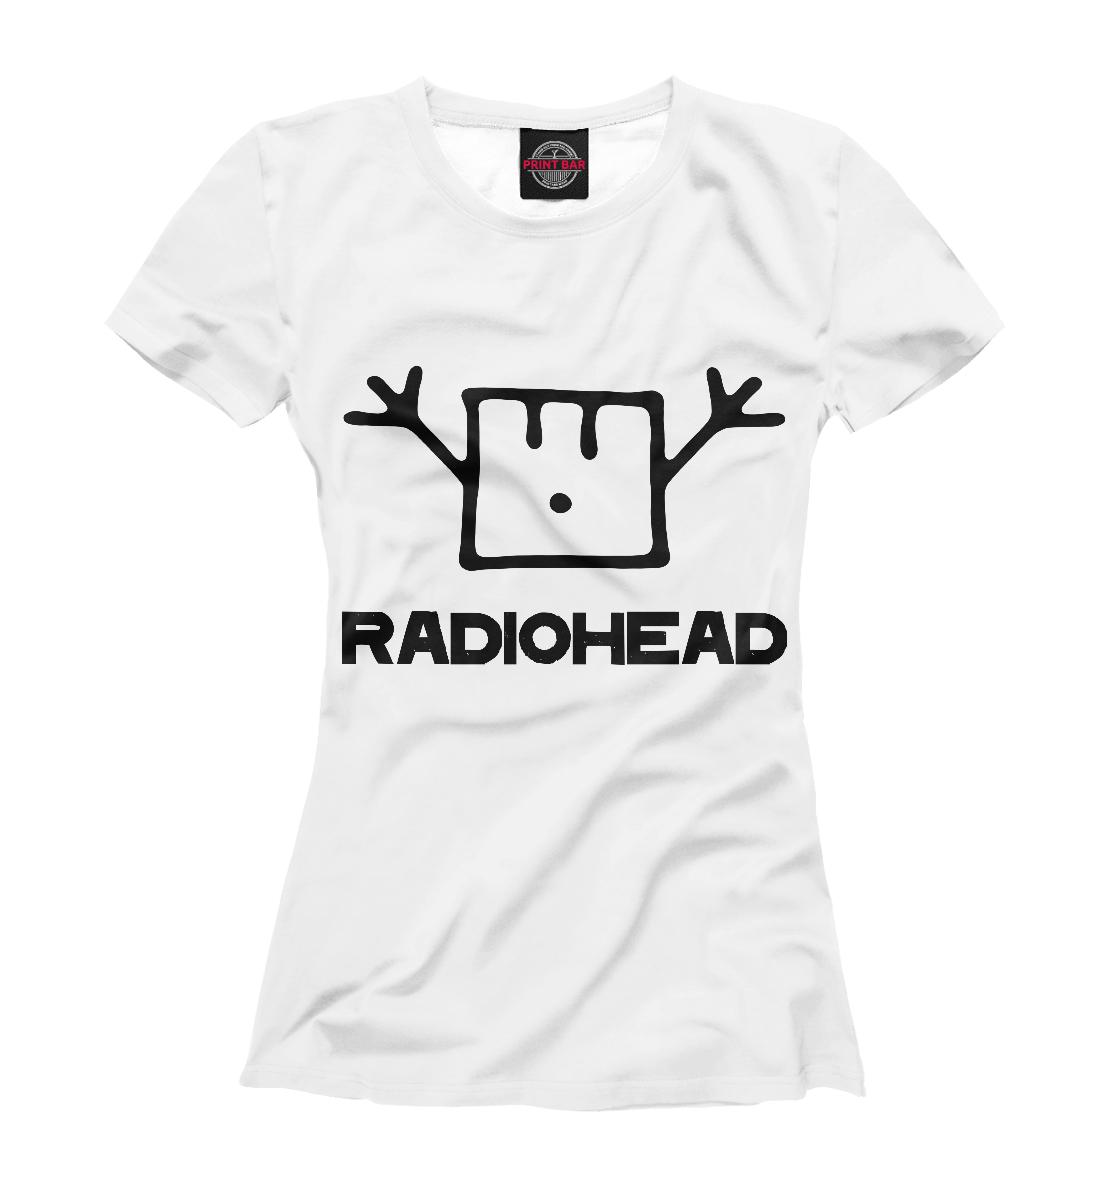 Купить Radiohead, Printbar, Футболки, MZK-142280-fut-1